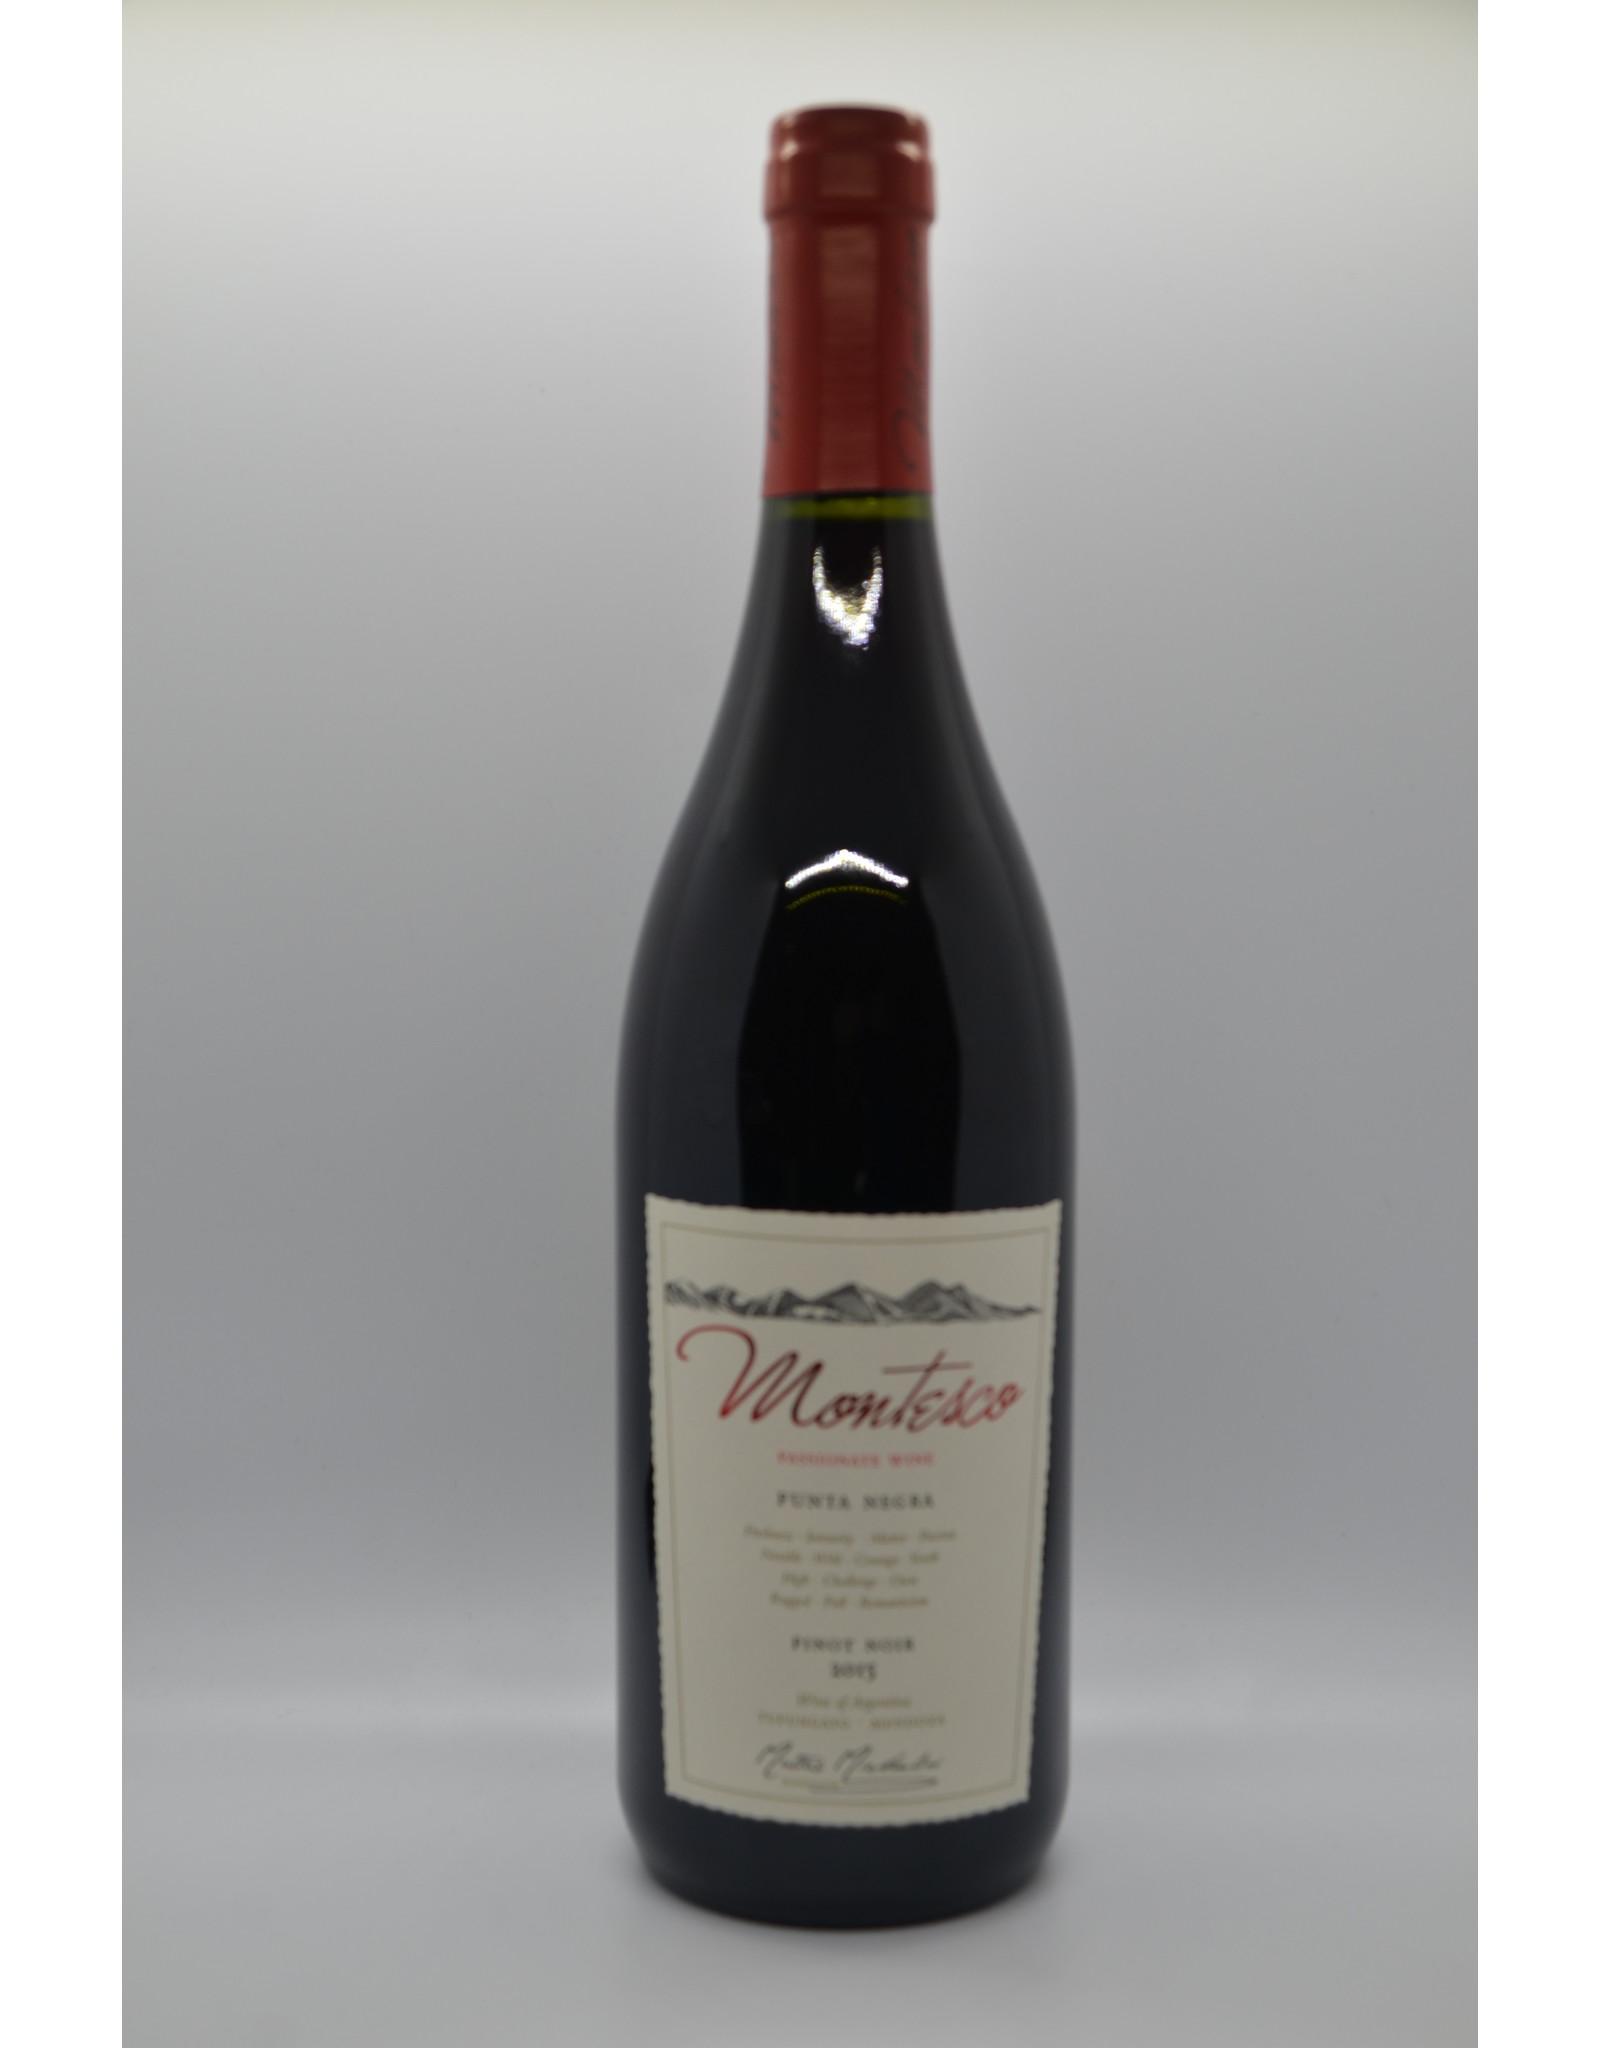 Argentina Montesco Punta Negra Pinot Noir